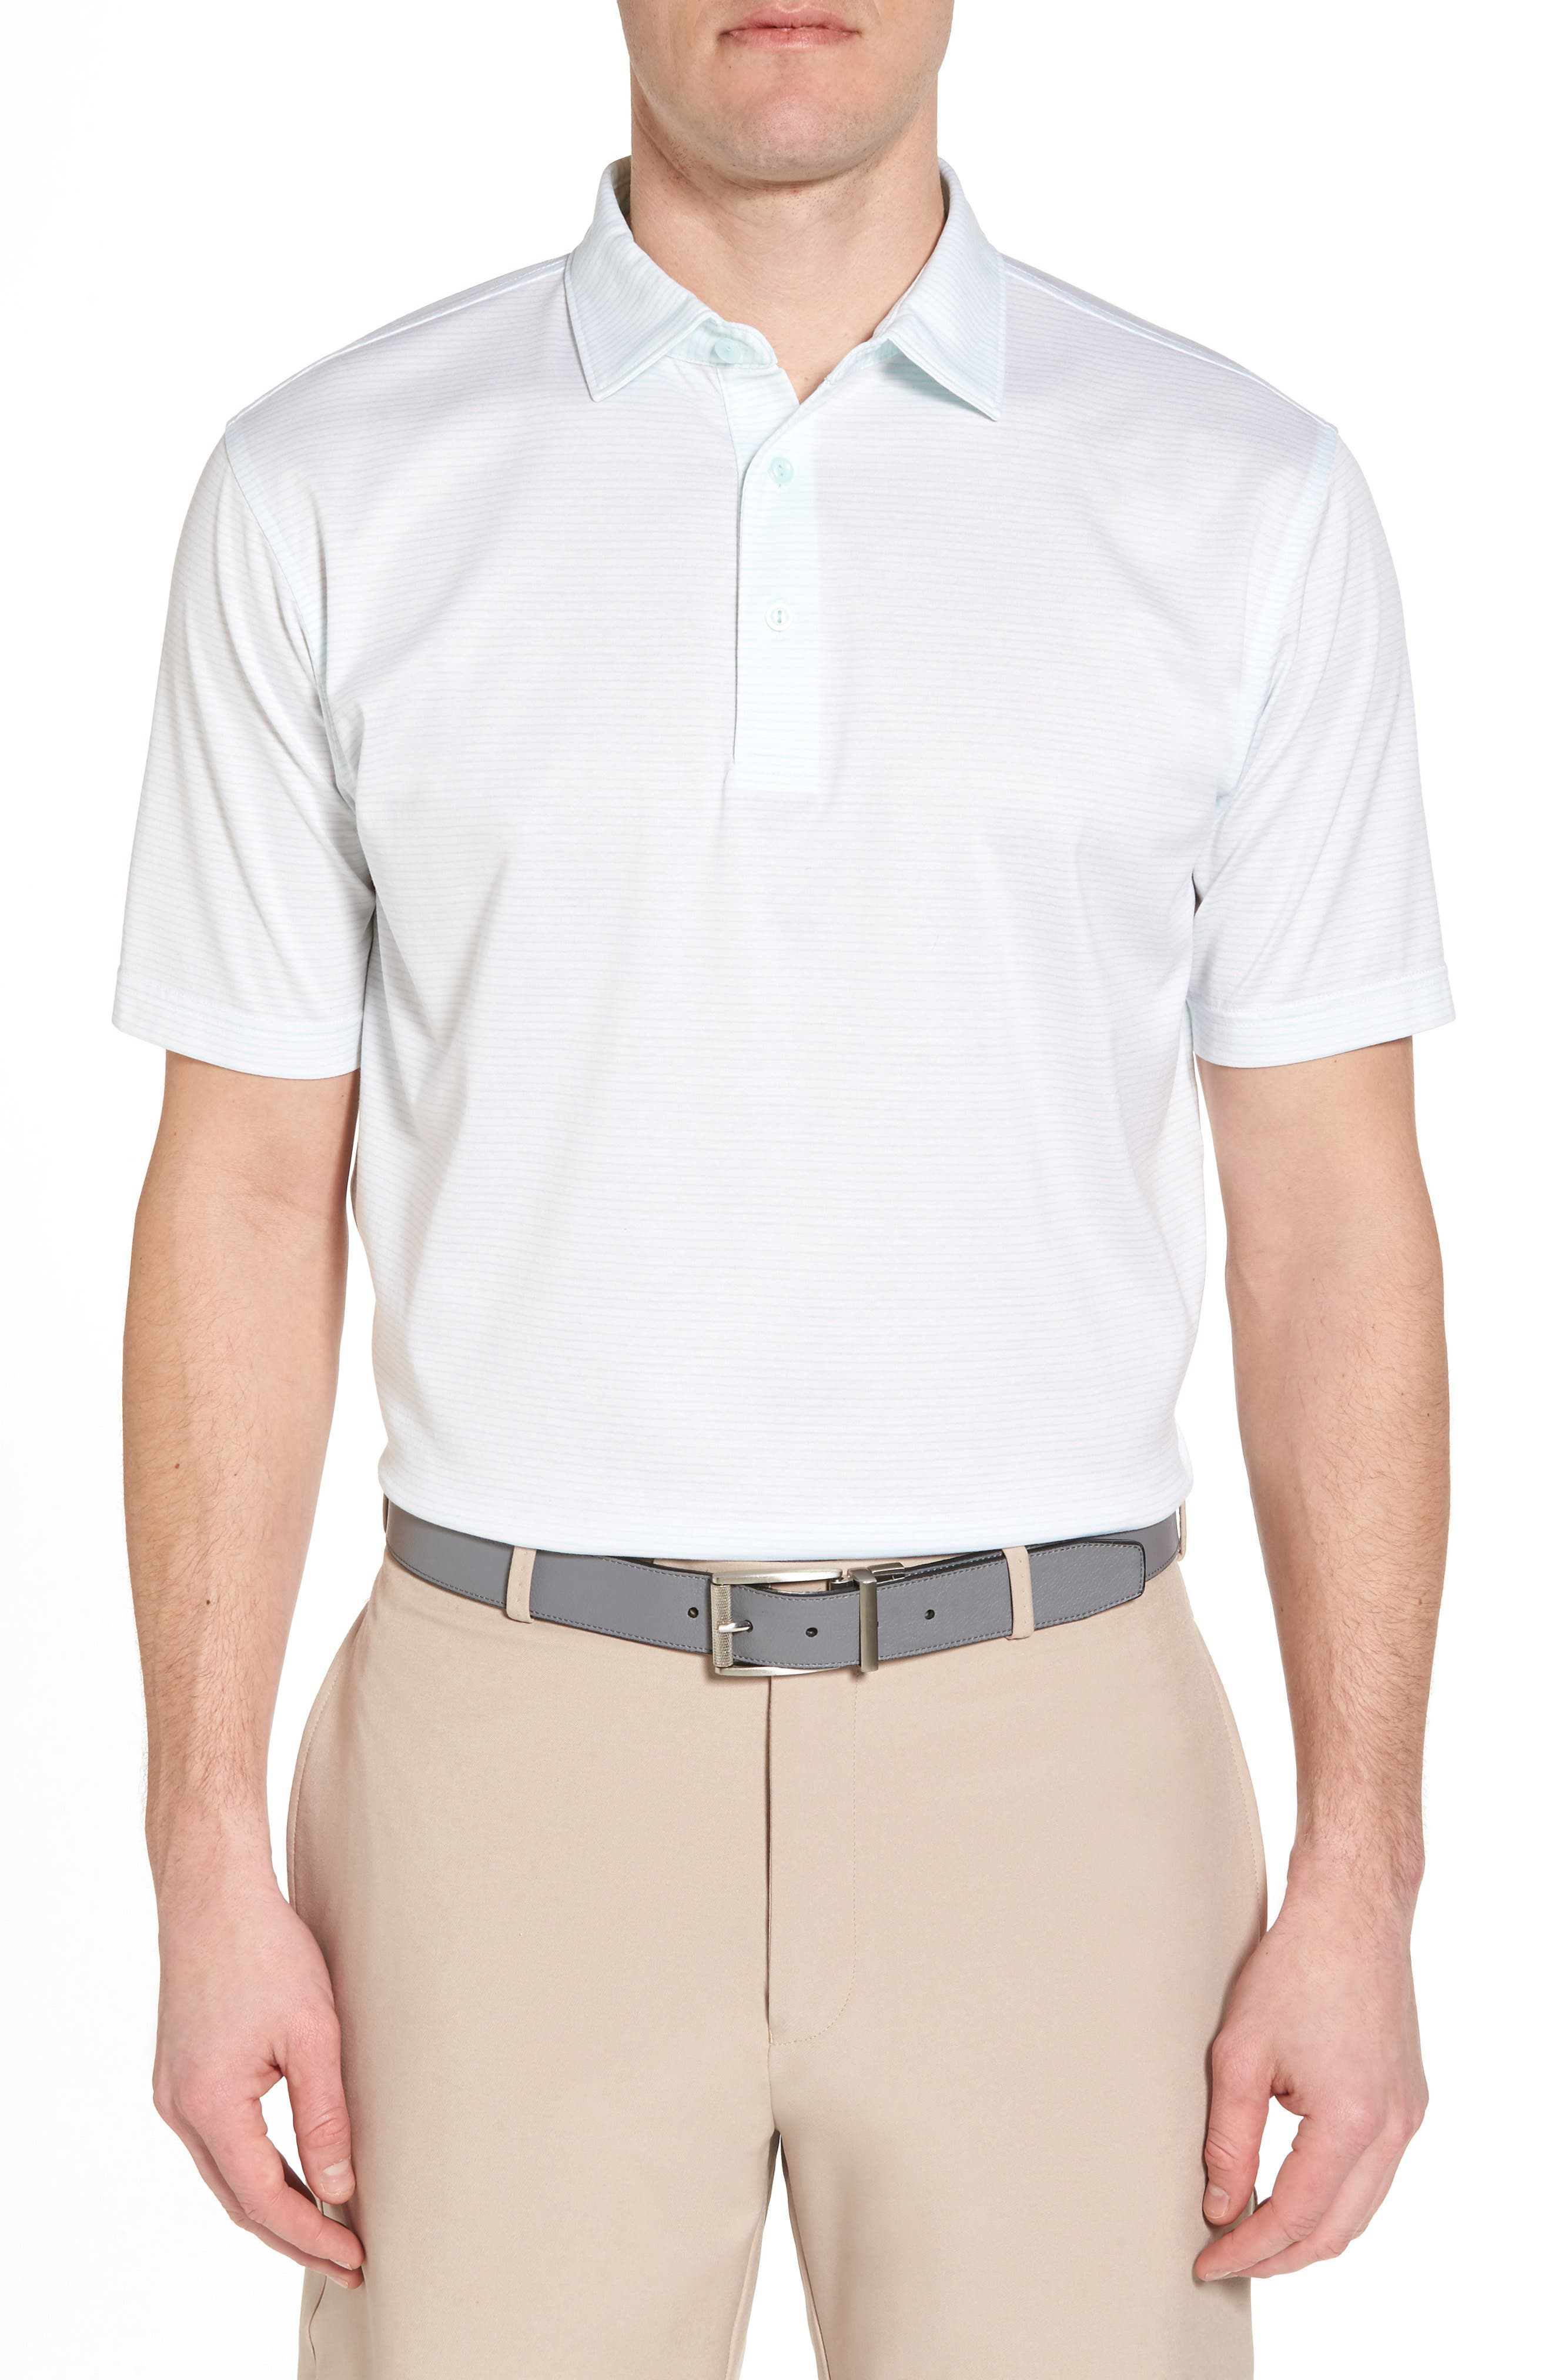 Sean Heritage Stripe Nanoluxe Polo,                         Main,                         color, White/ Heron Blue